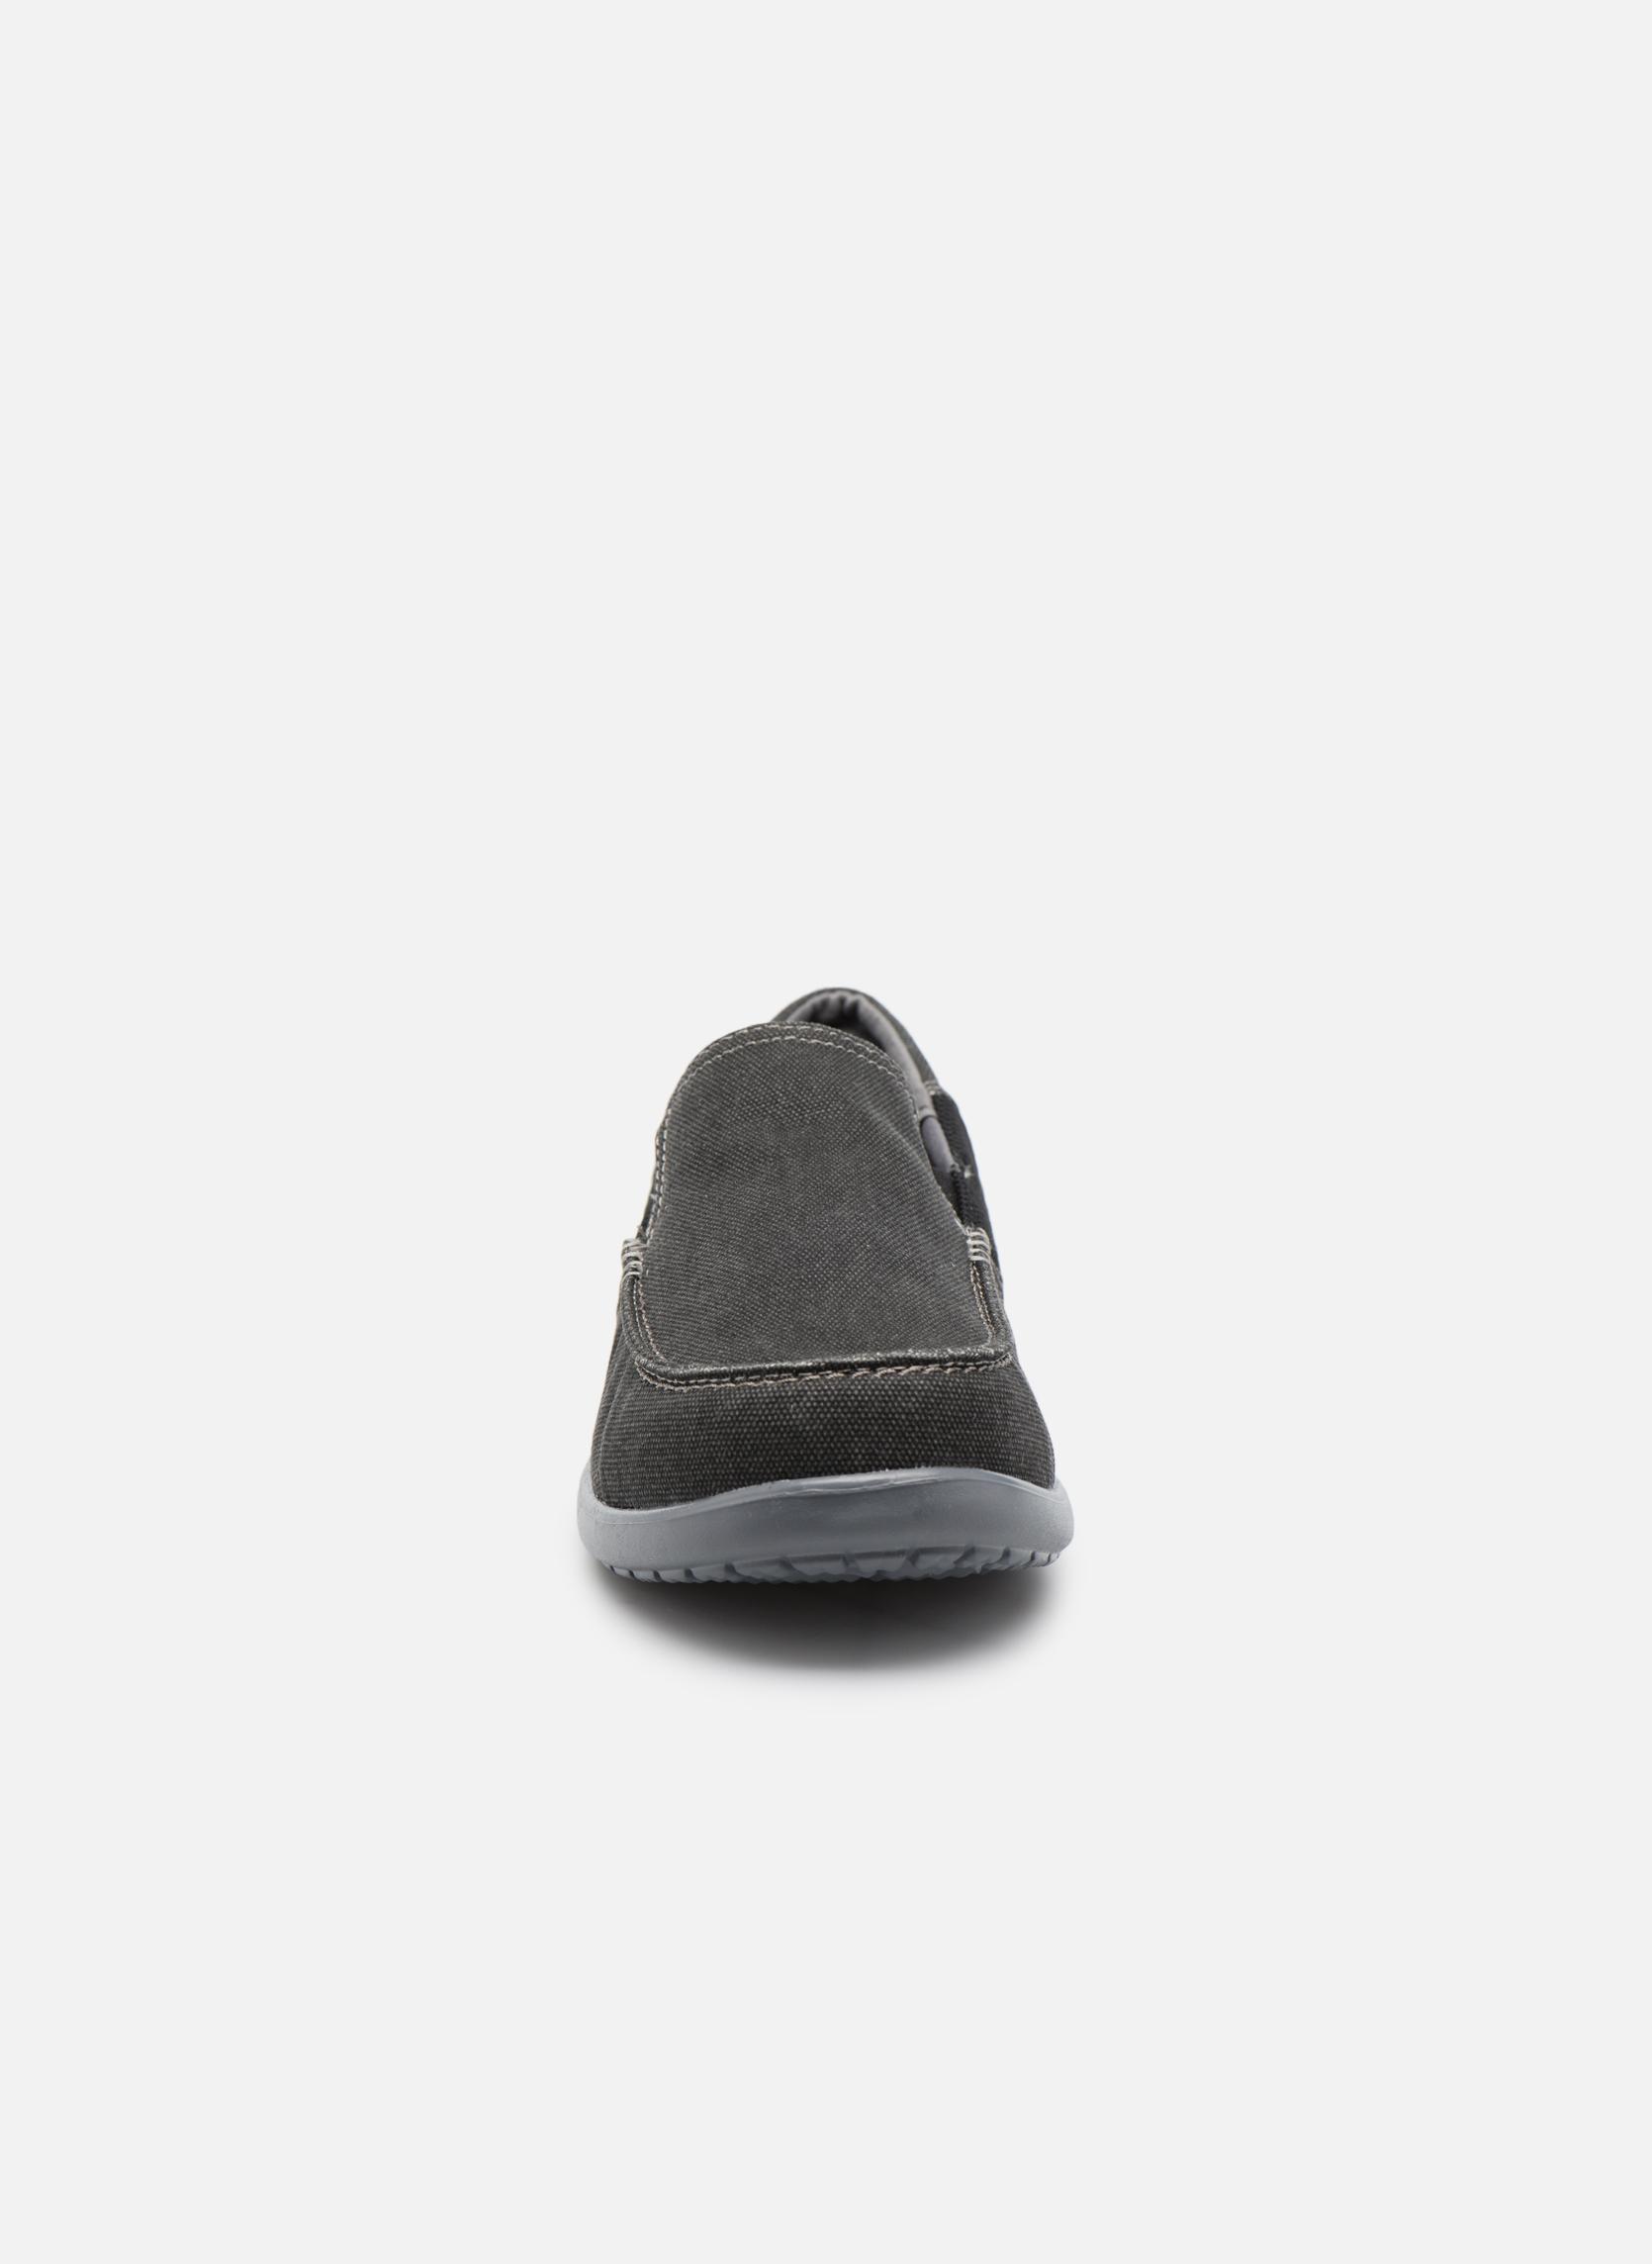 Santa Cruz 2 Luxe M Black/charcoal